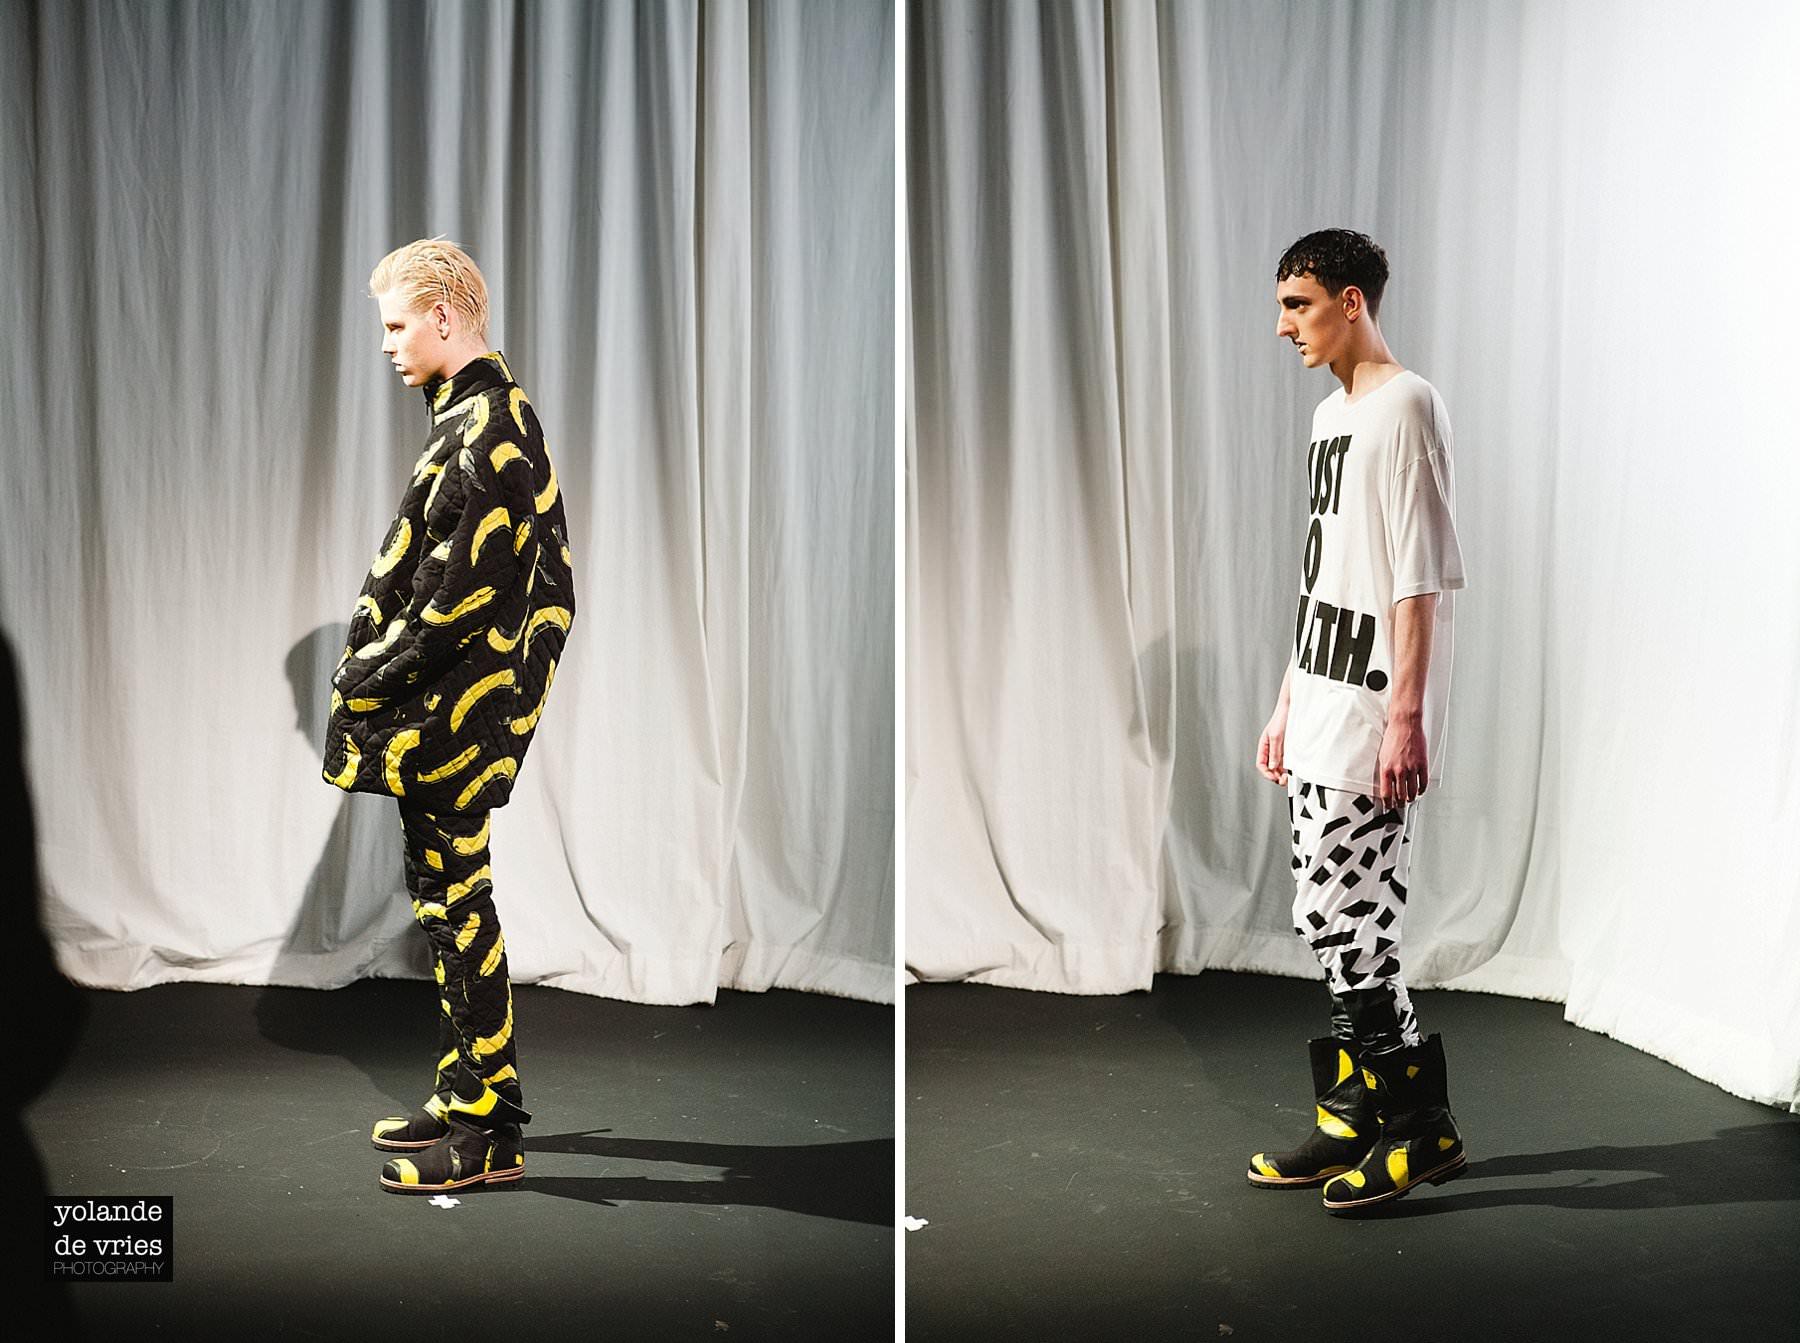 Horace AW11 banana suit on catwalk London photographer